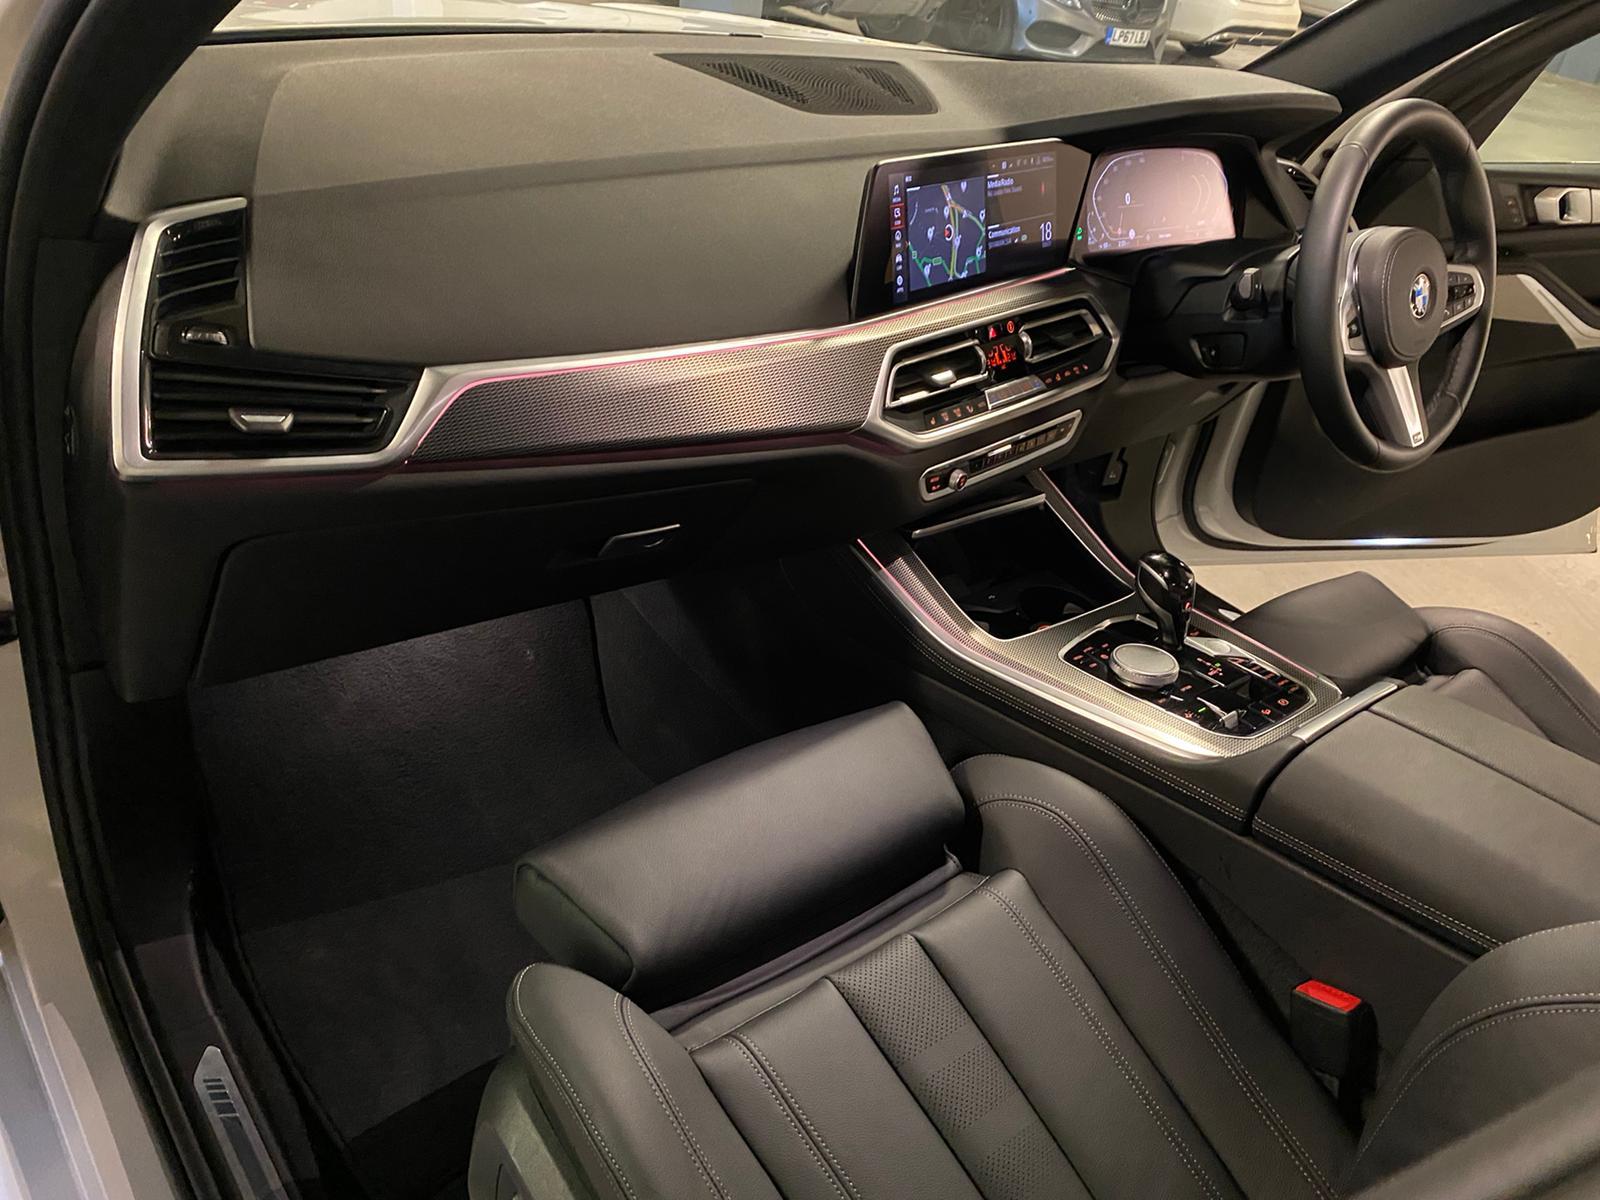 BMW X5 3.0 XDRIVE 30D M SPORT StationWagon